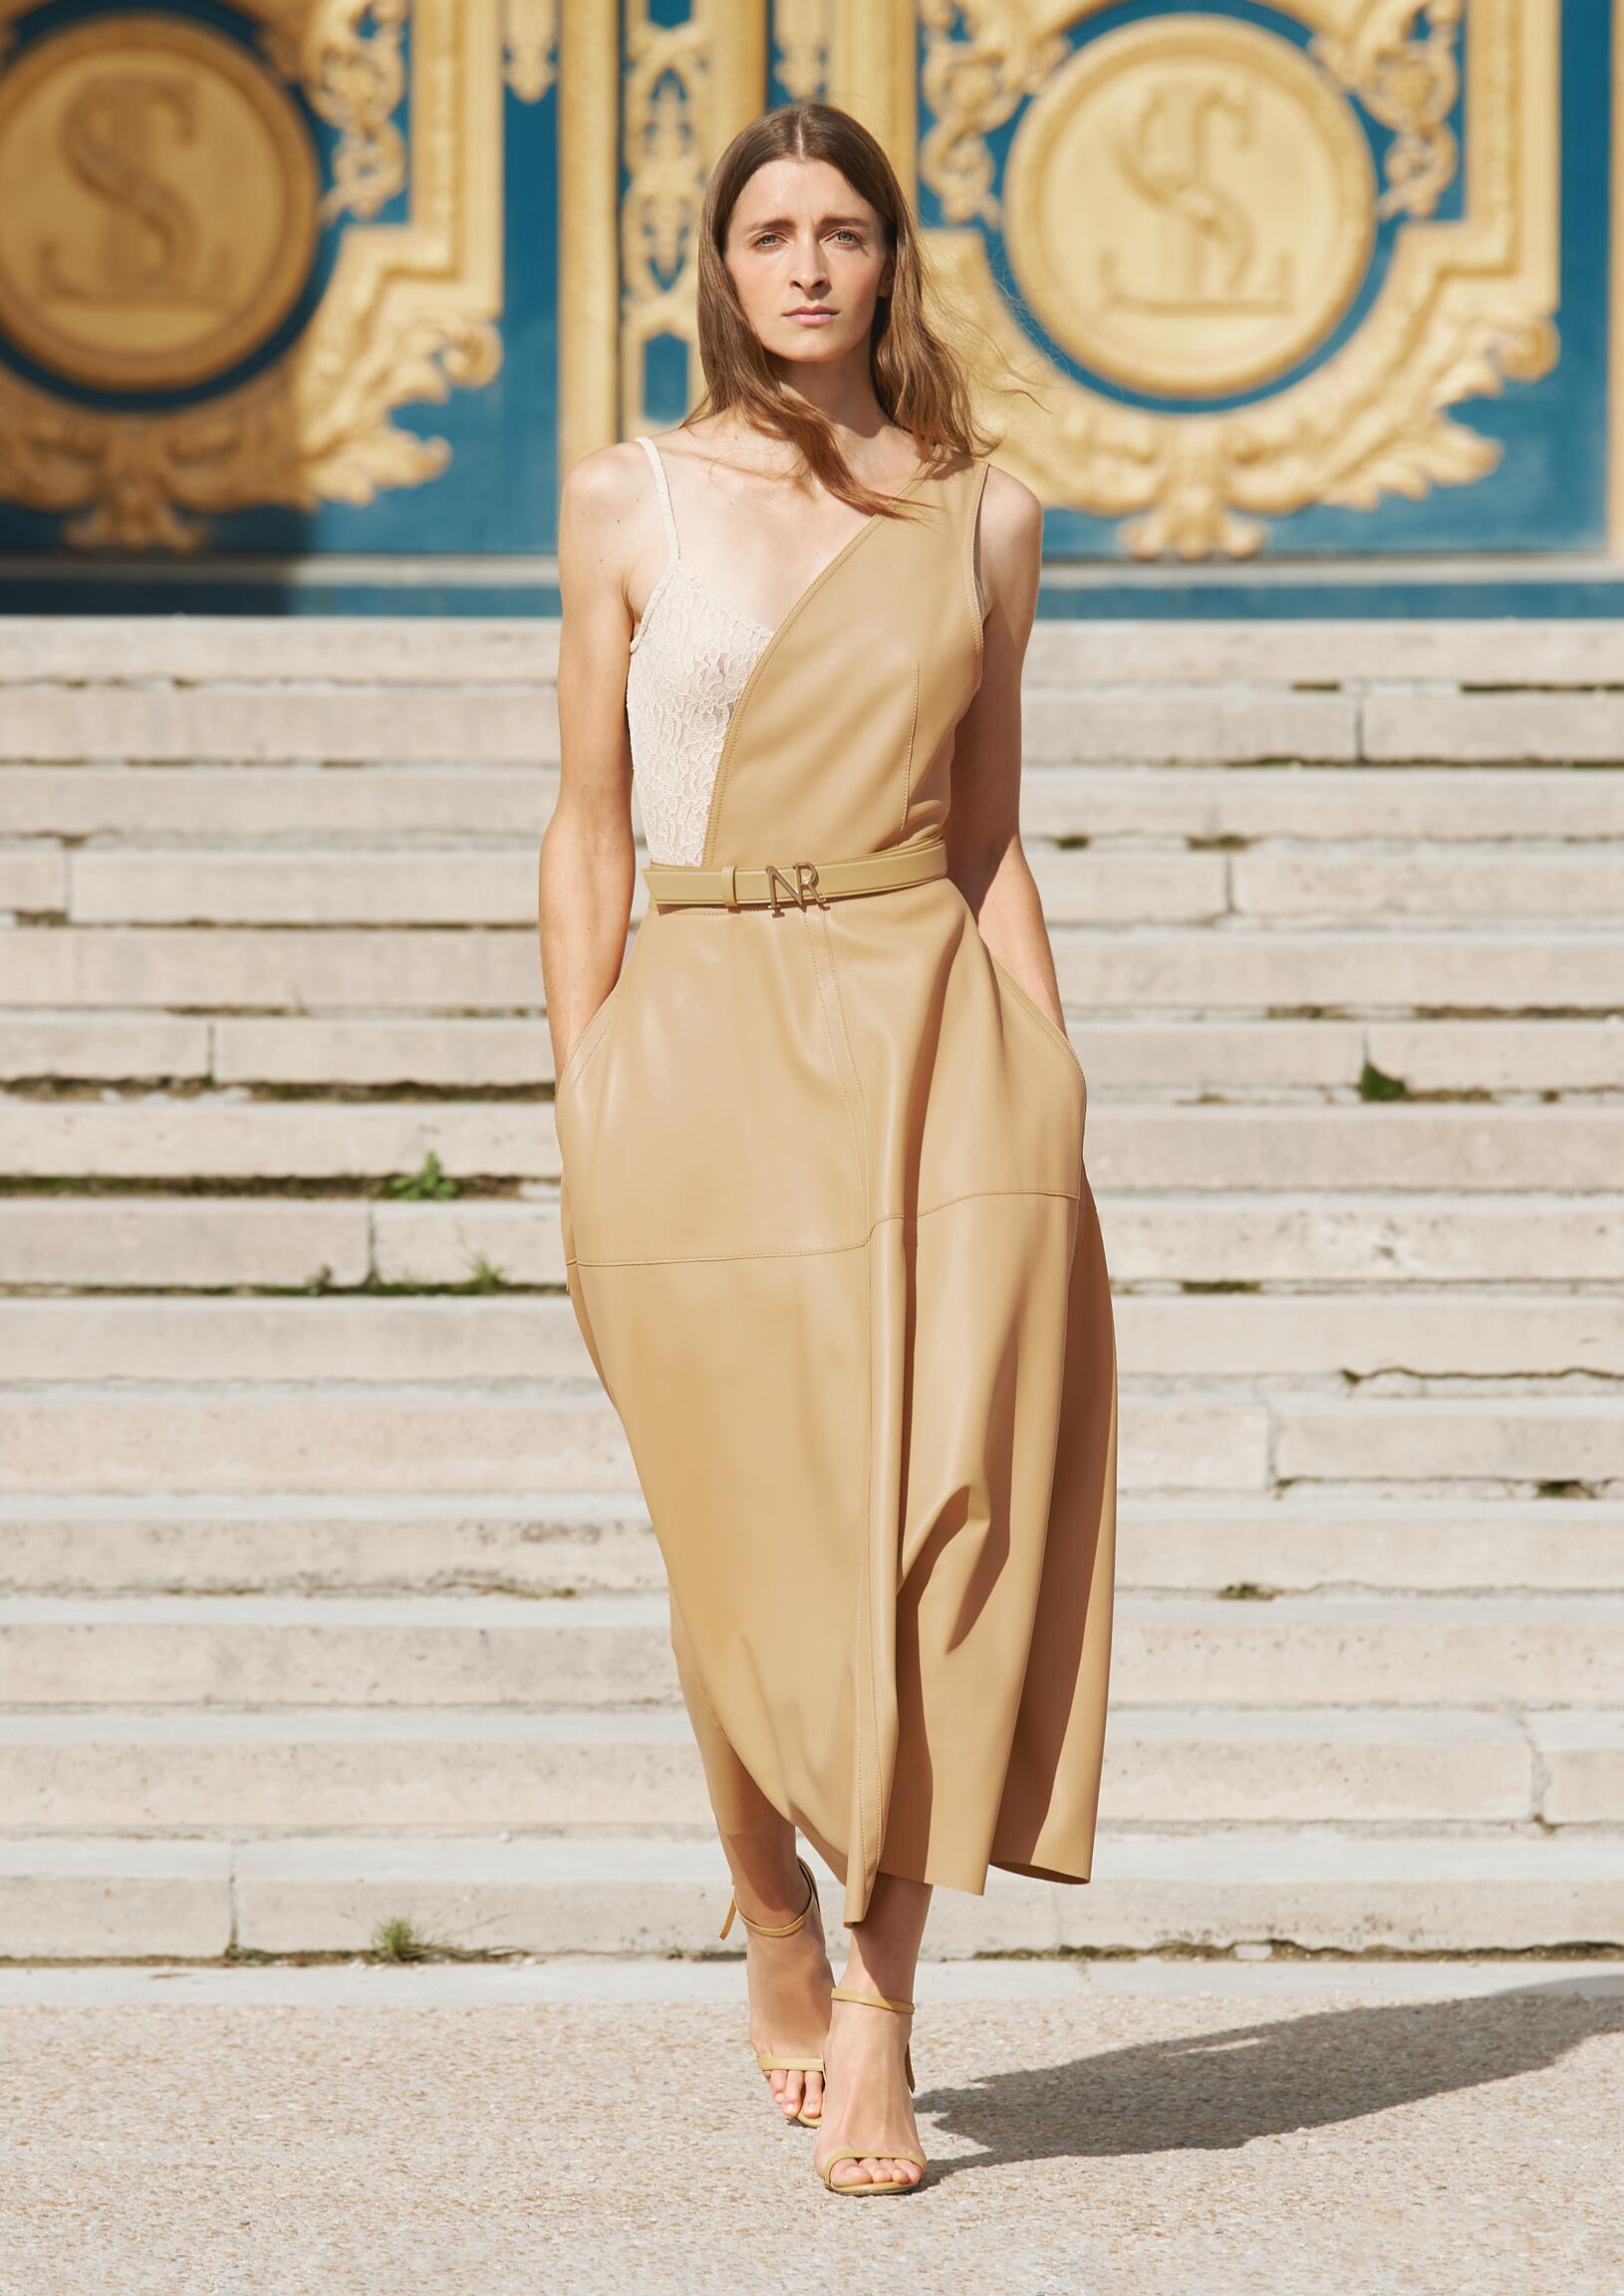 Fashion Model Nina Ricci Catwalk